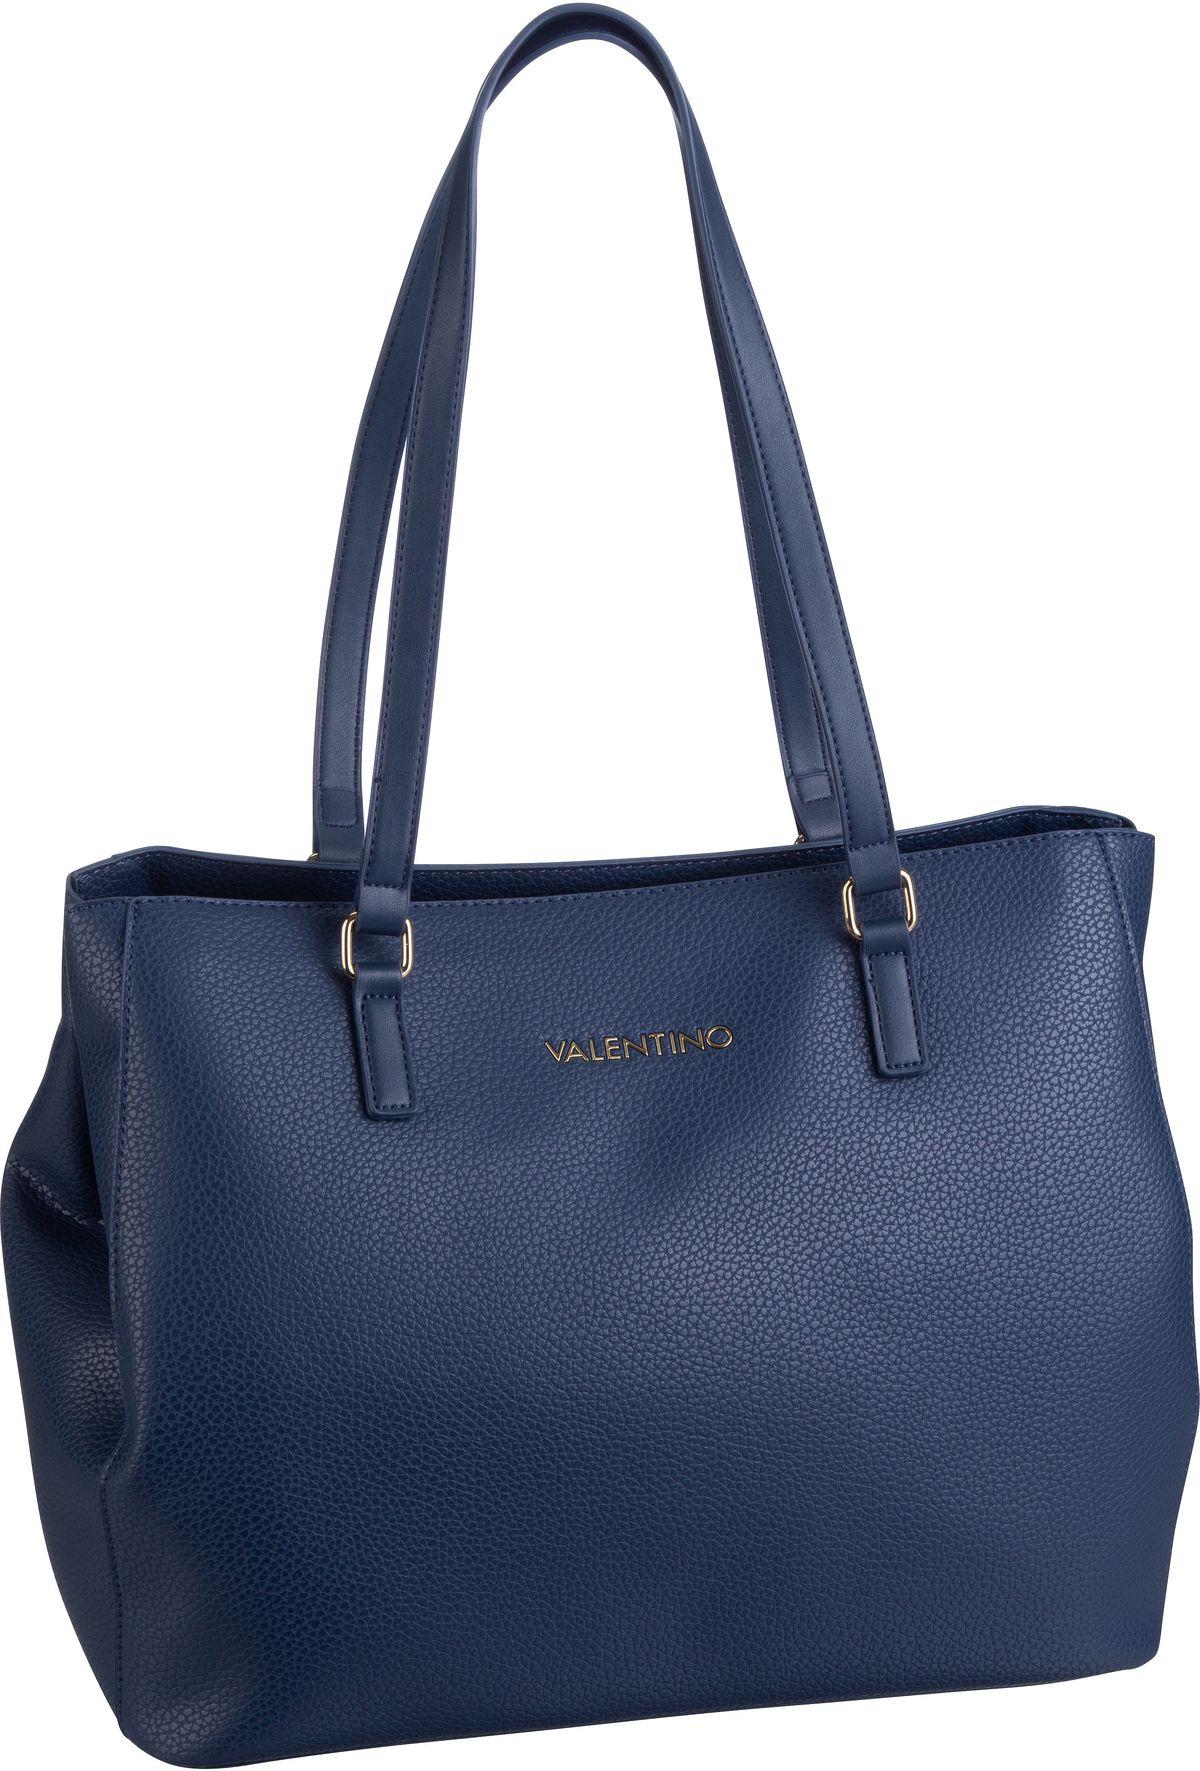 valentino bags -  Shopper Superman Shopping U801 Navy